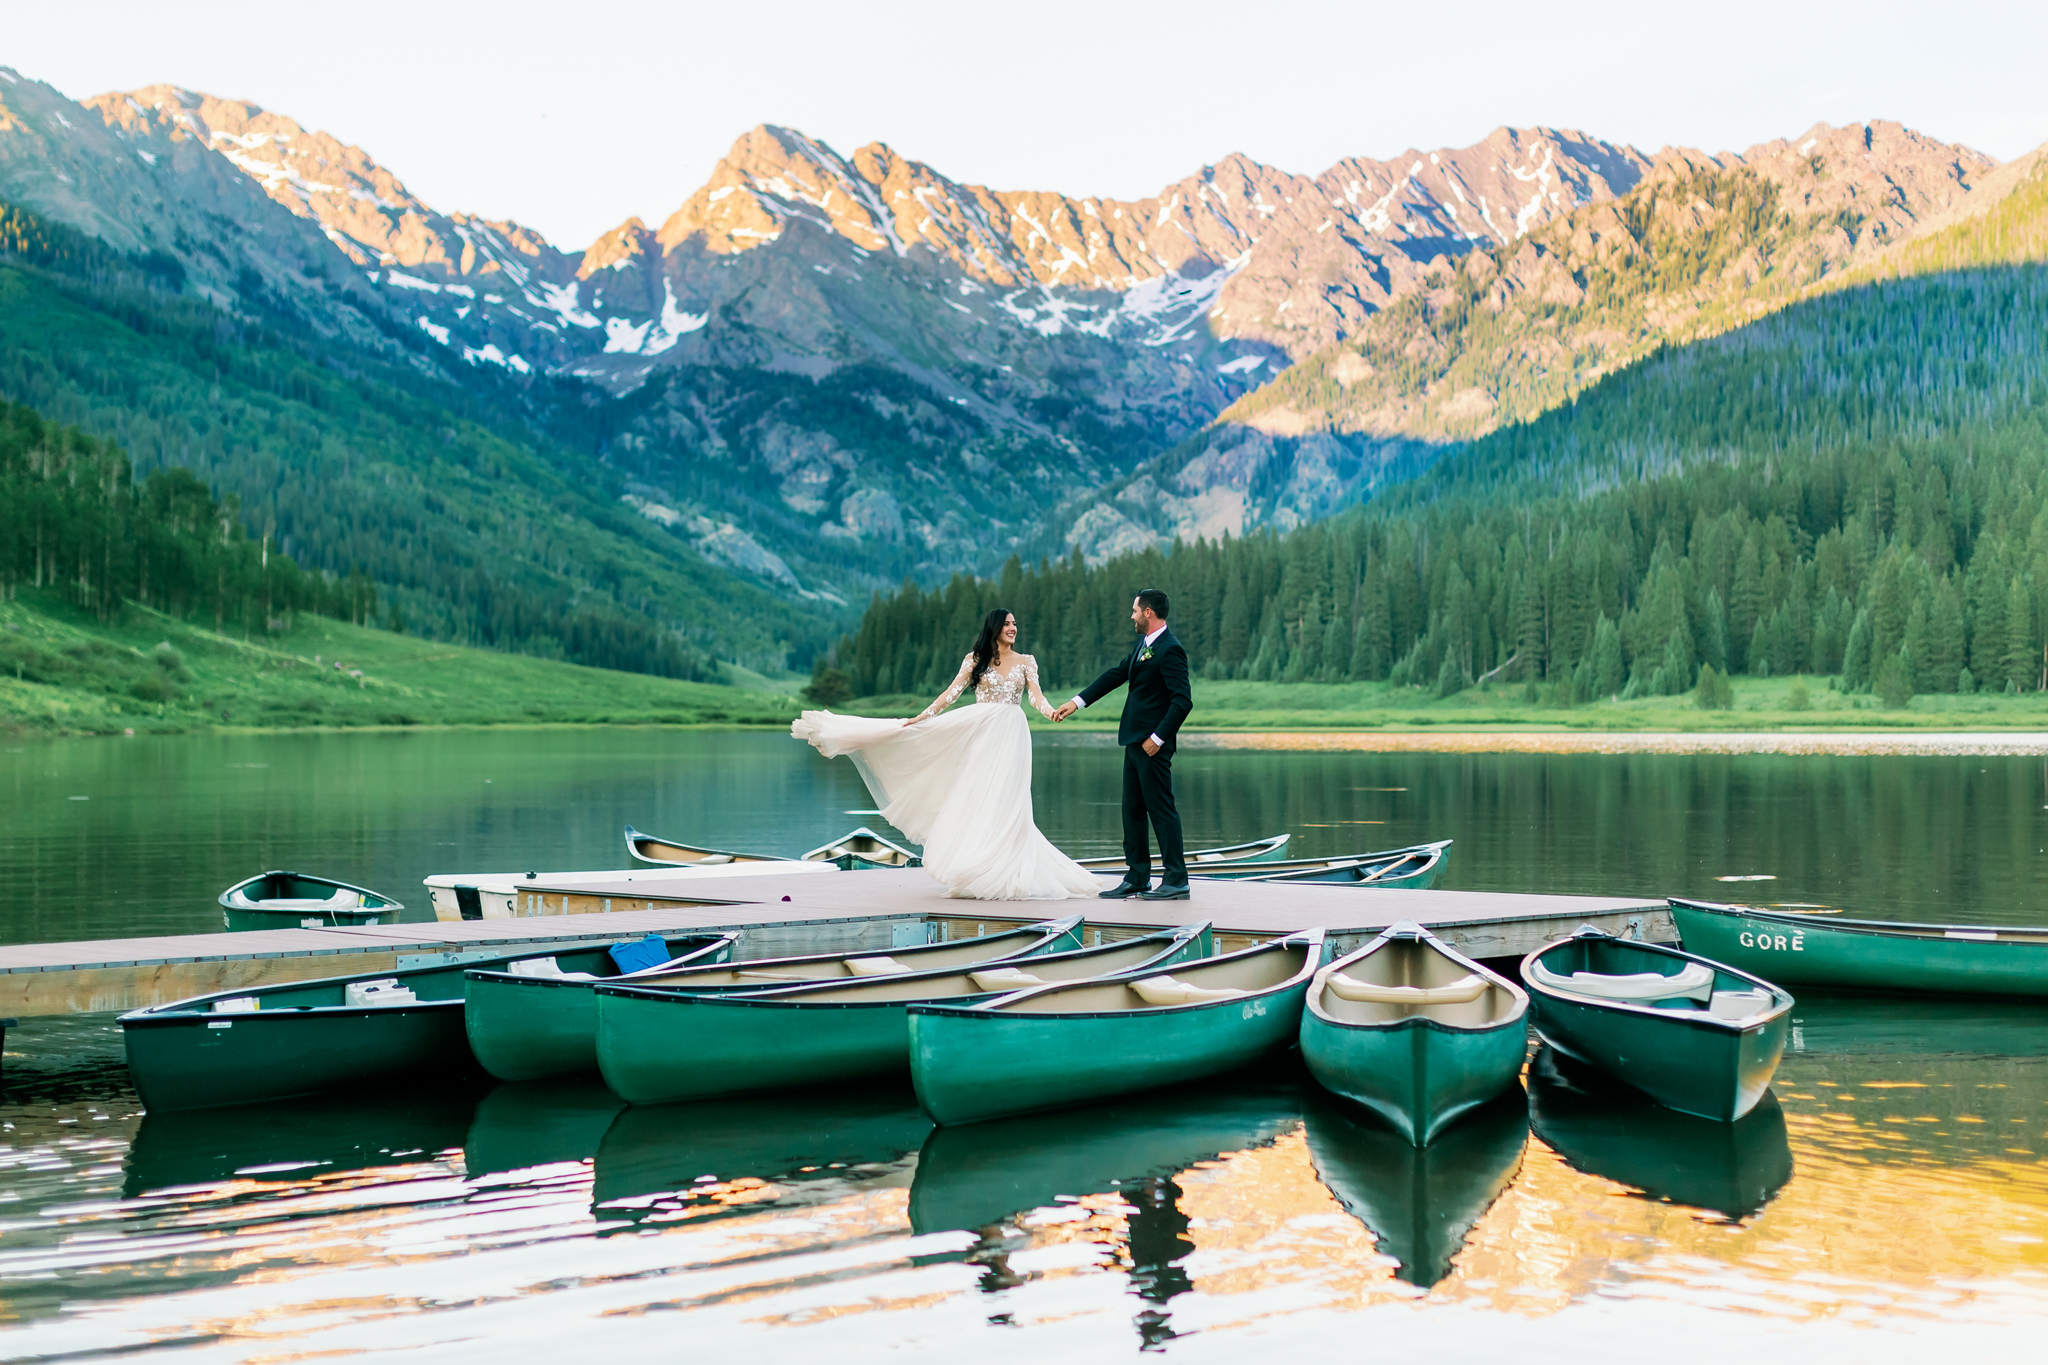 Jessica + Matt | Vail, Colorado | Piney River Ranch